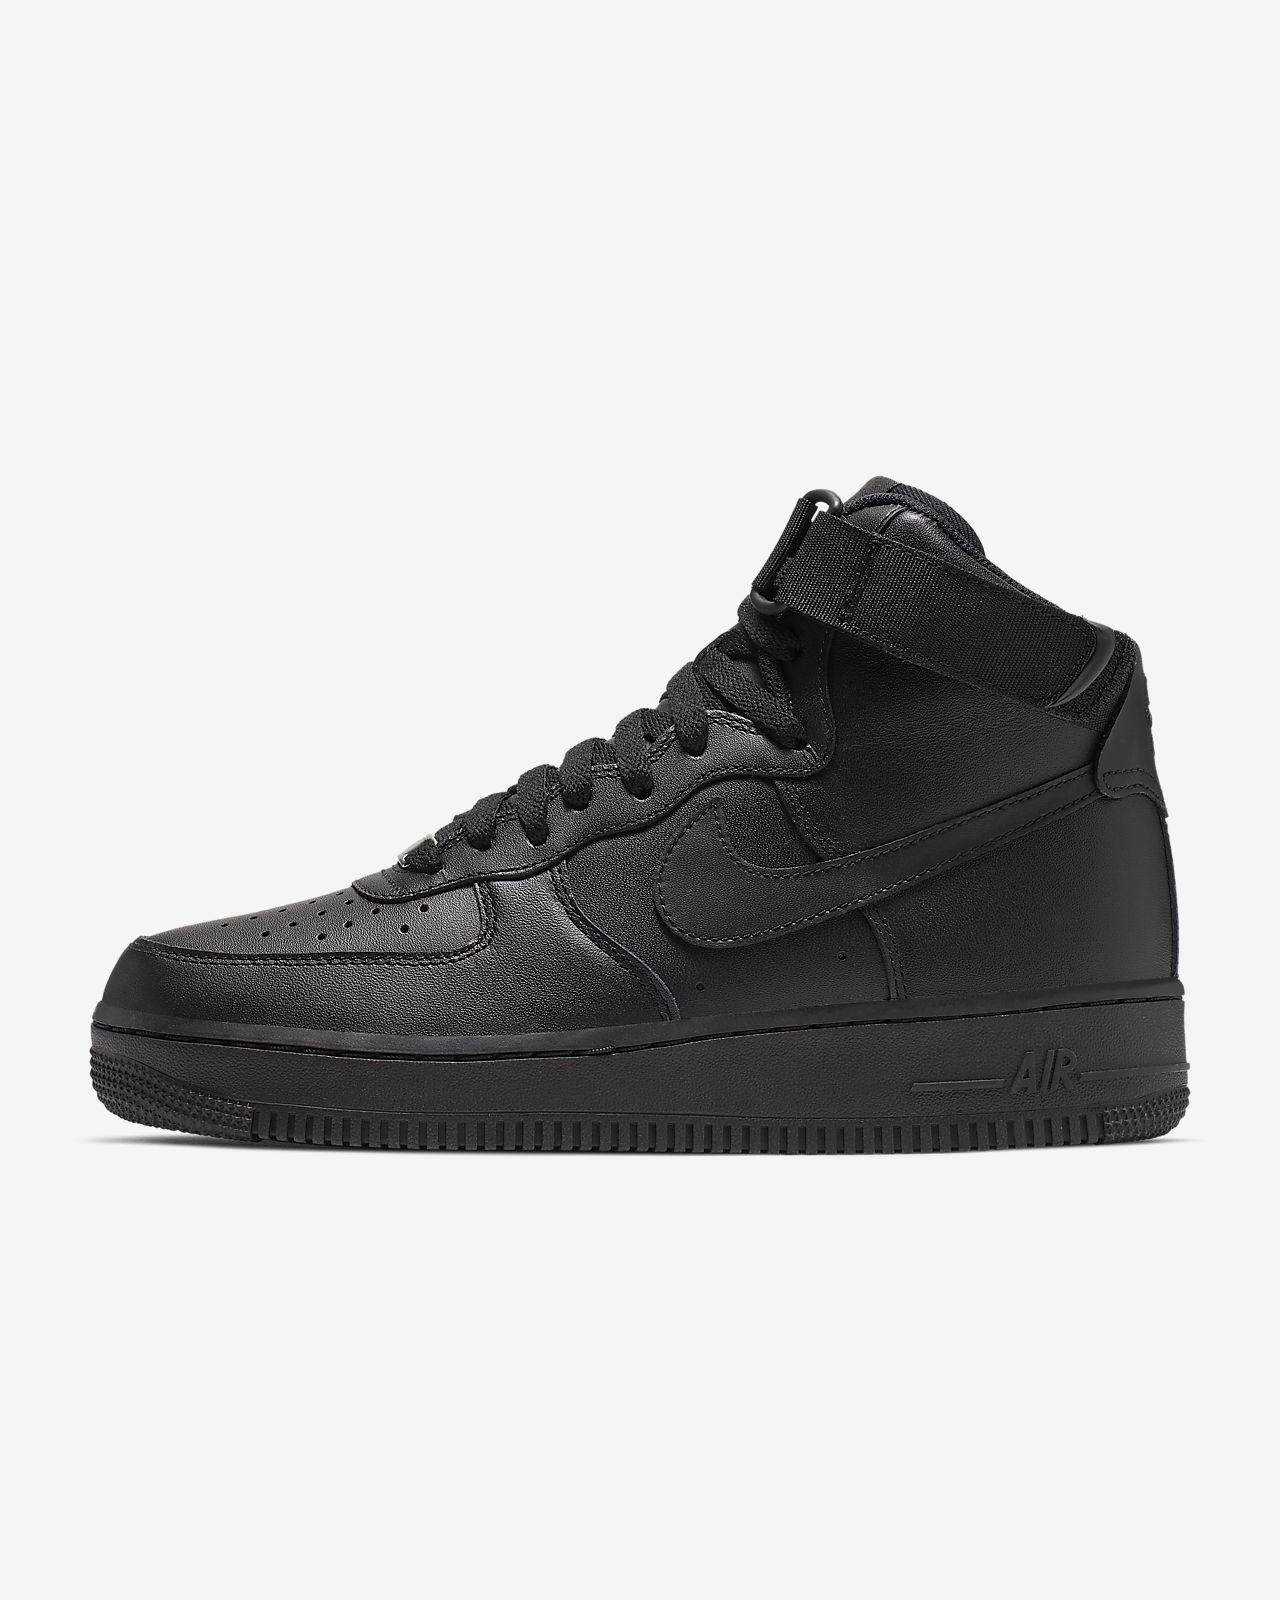 watch 1717a f2027 Nike Air Force 1 High 08 LE Women's Shoe